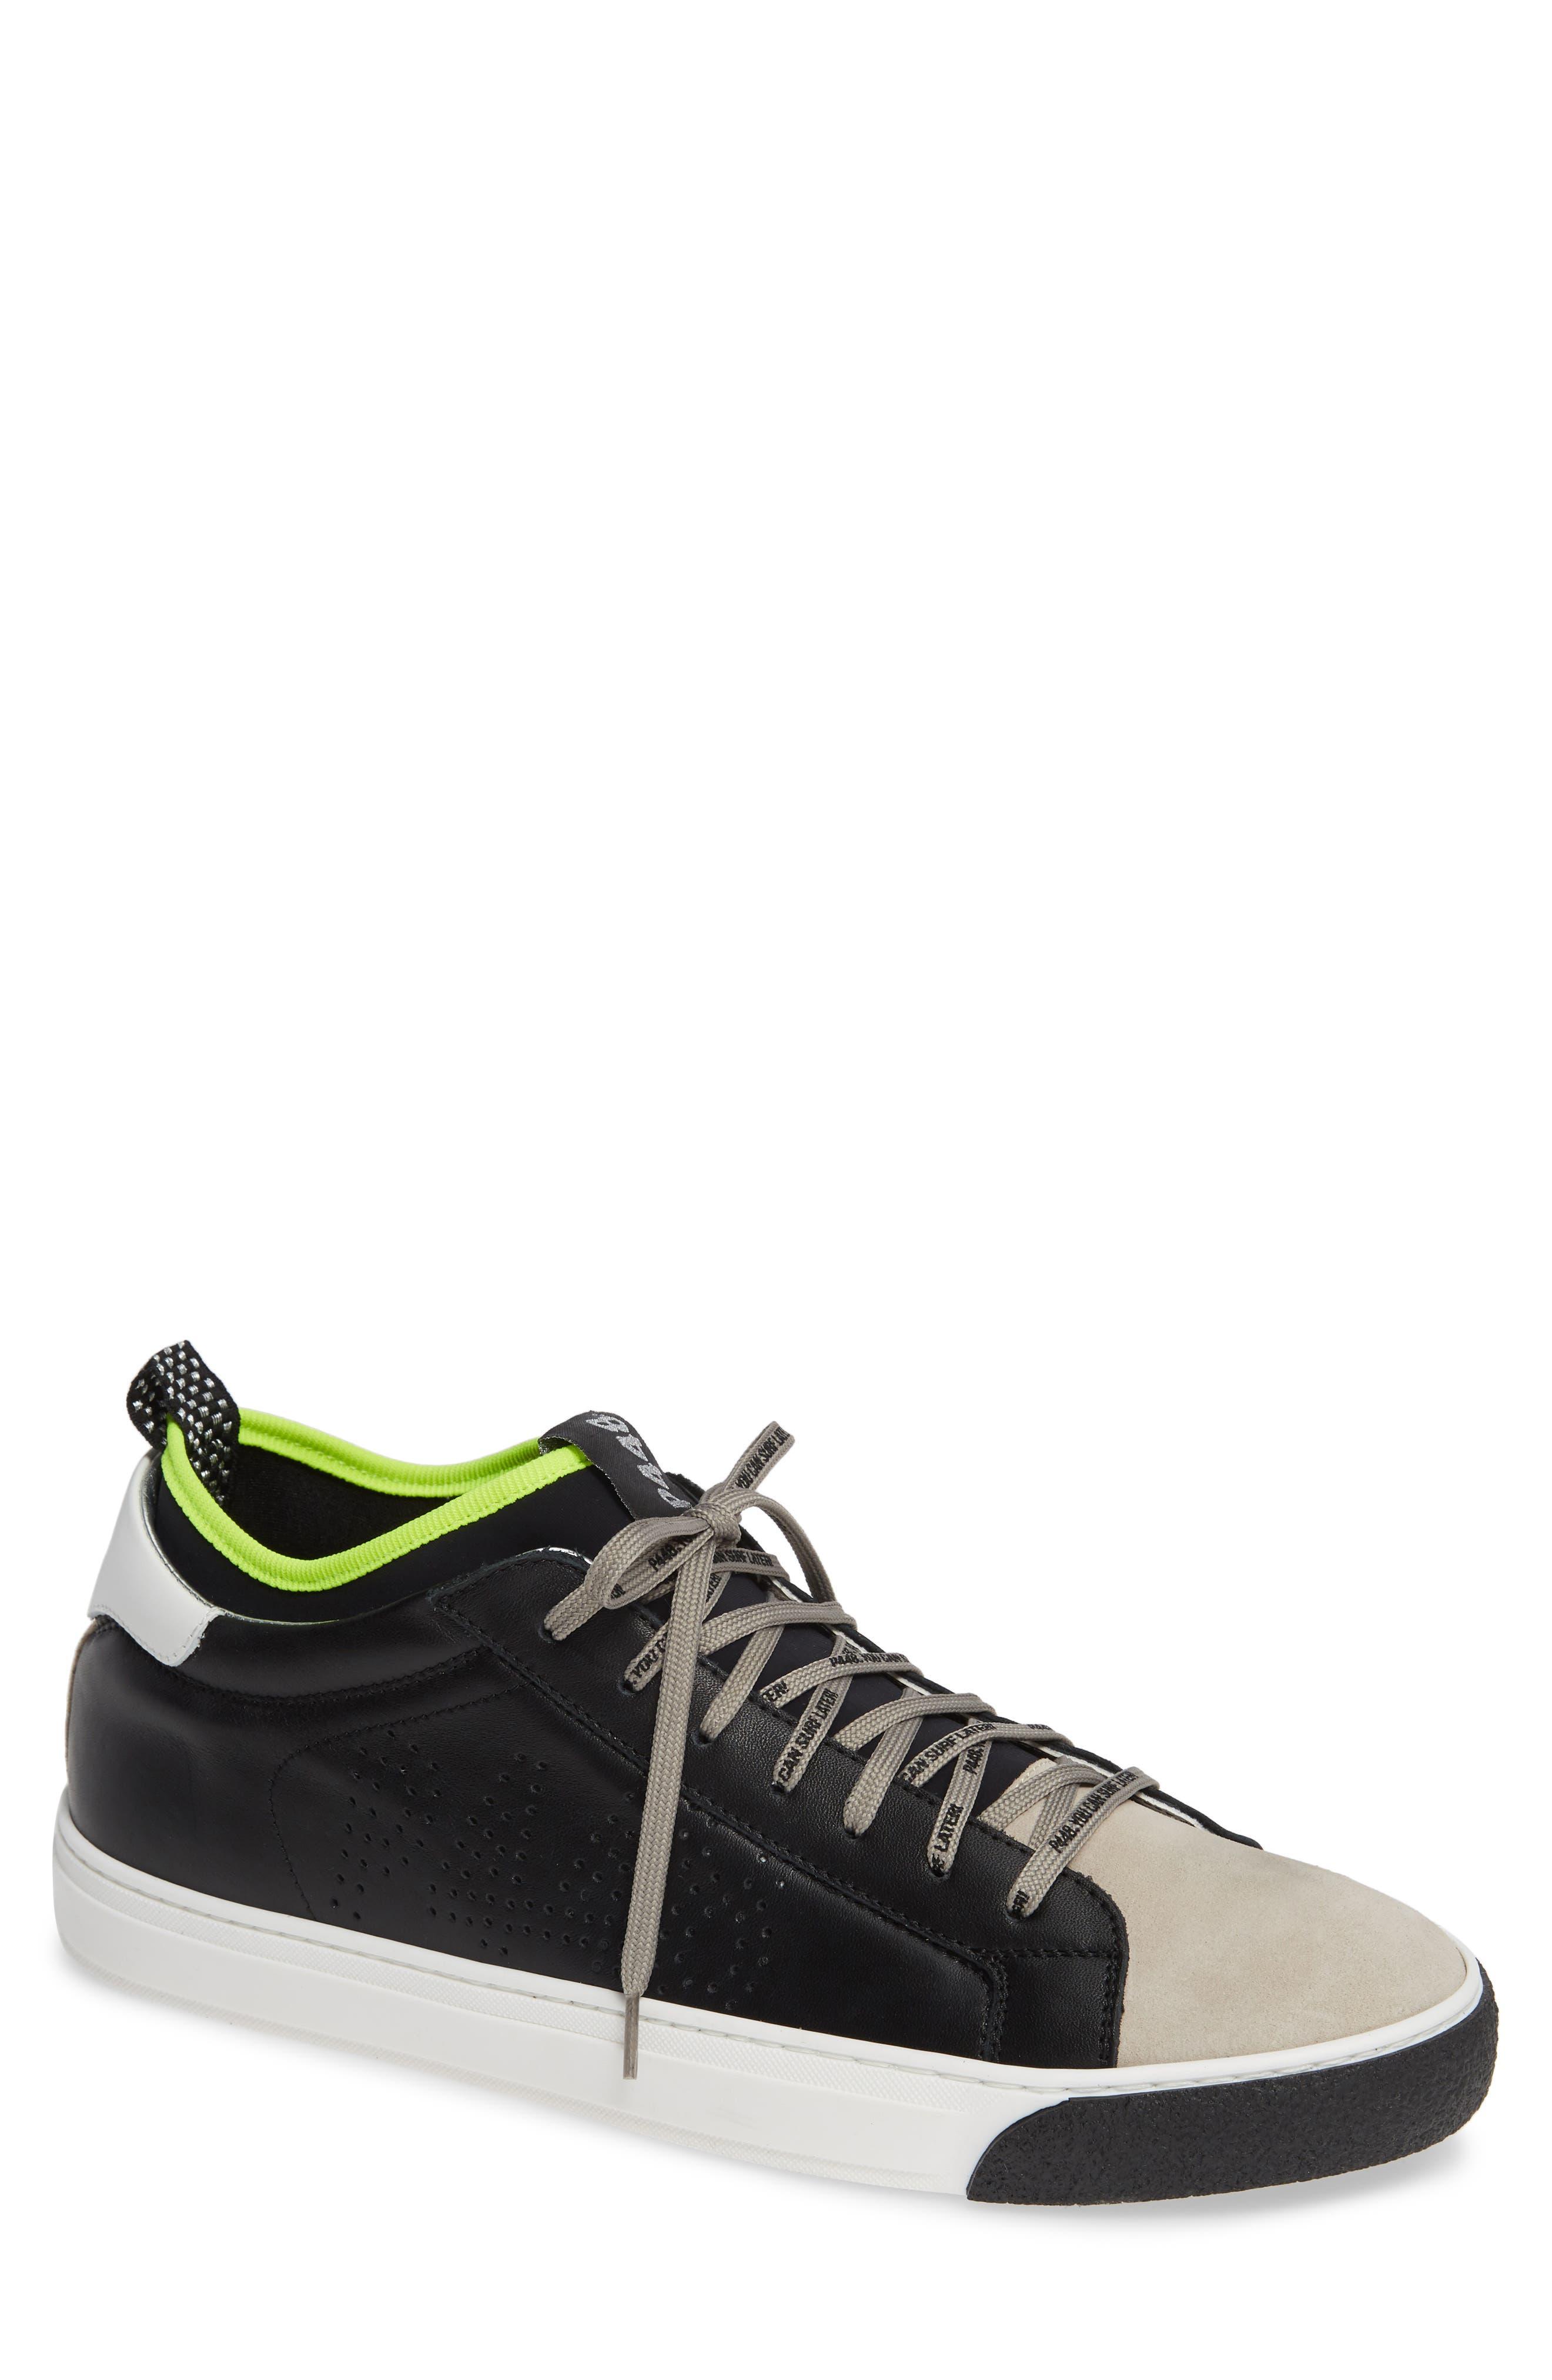 A8miamijsocks Sneaker,                             Main thumbnail 1, color,                             BLACK